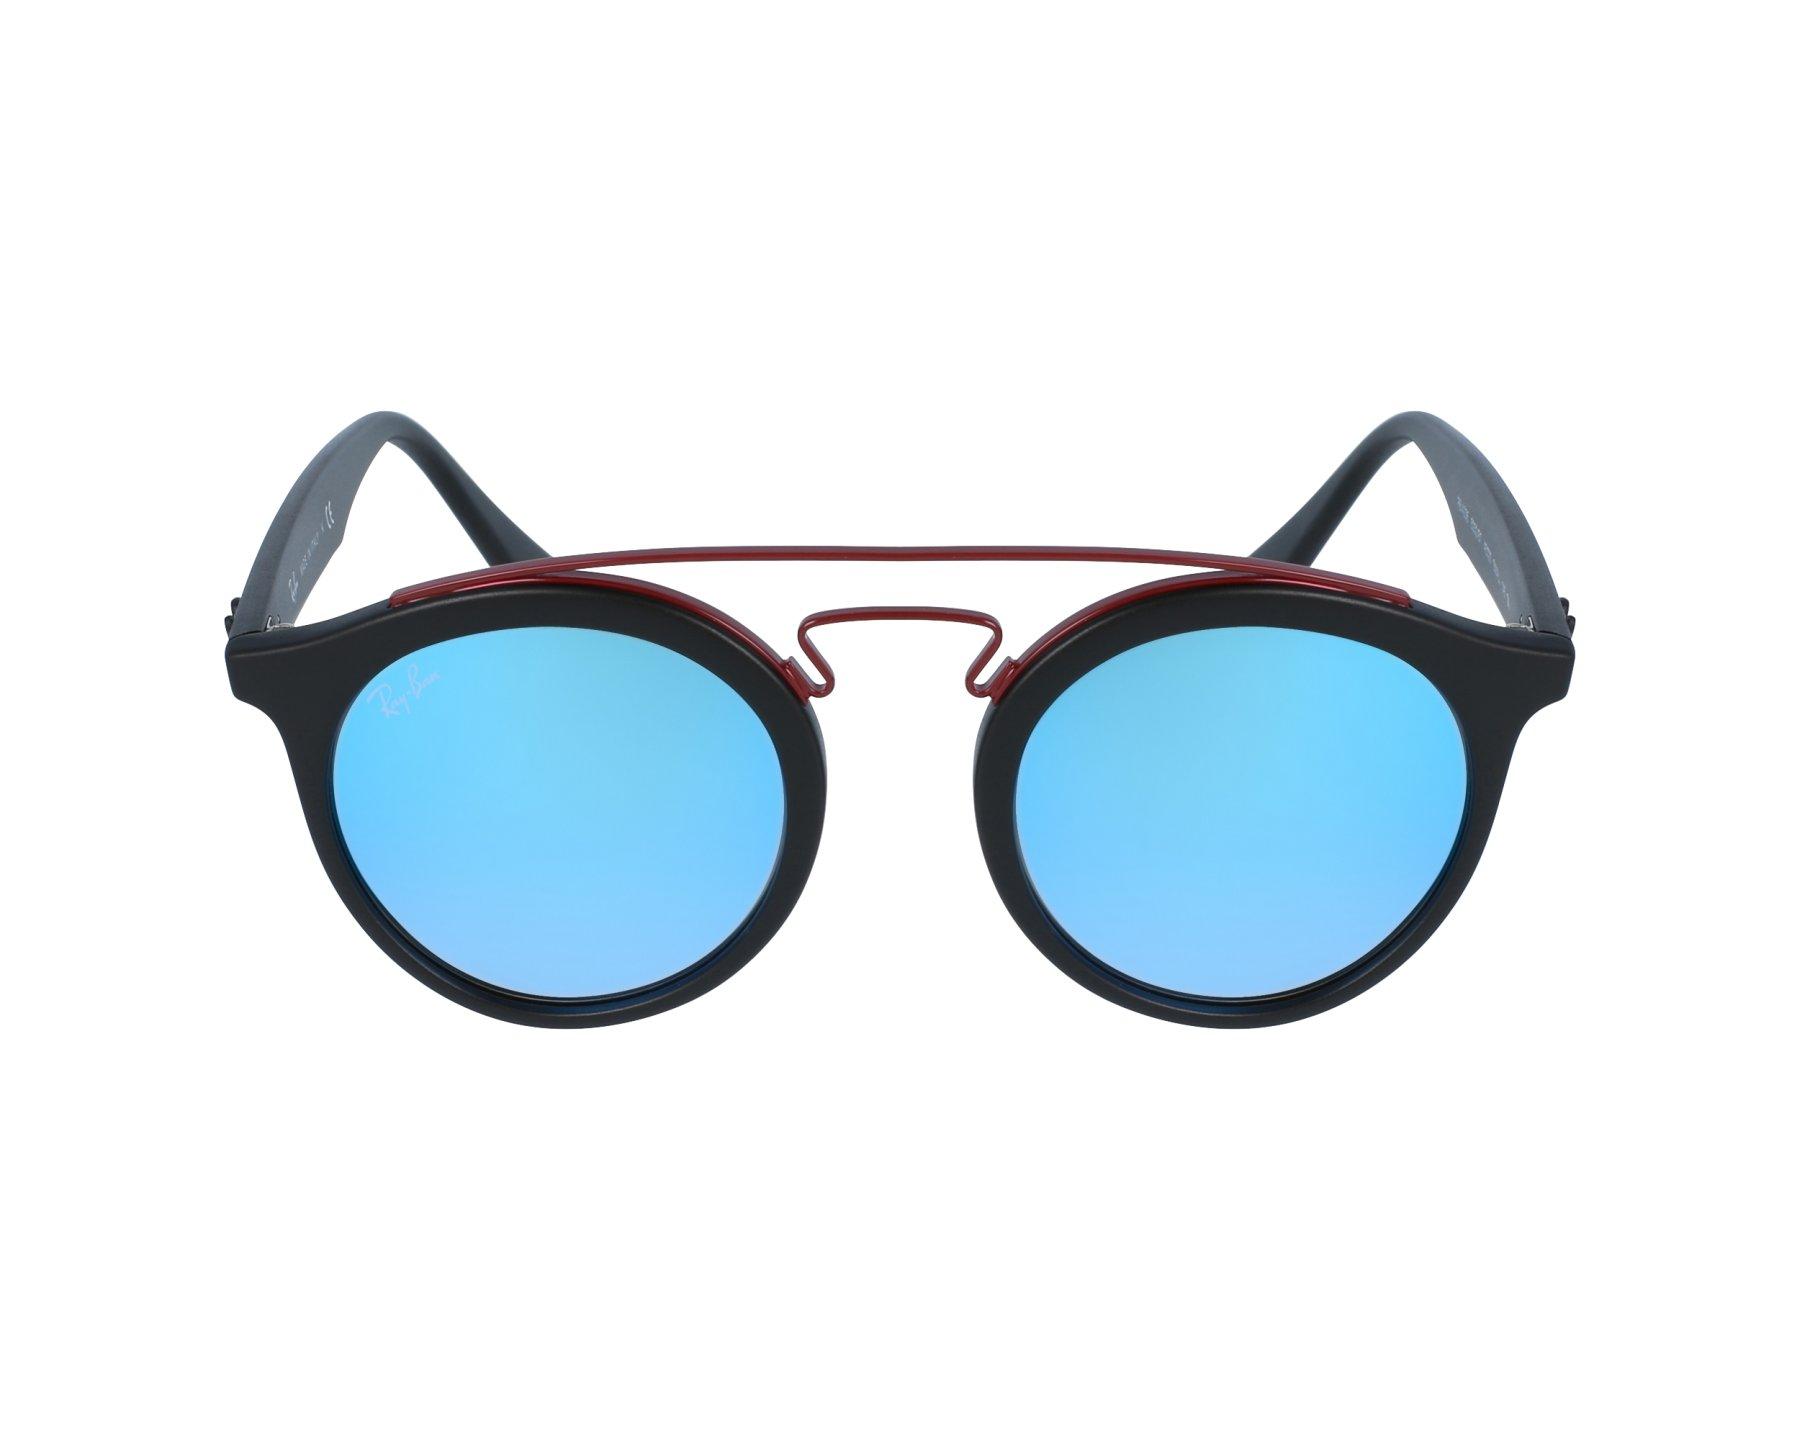 thumbnail Sunglasses Ray-Ban RB-4256 6252 B7 - Black Bordeaux profile view 81240a34aa94